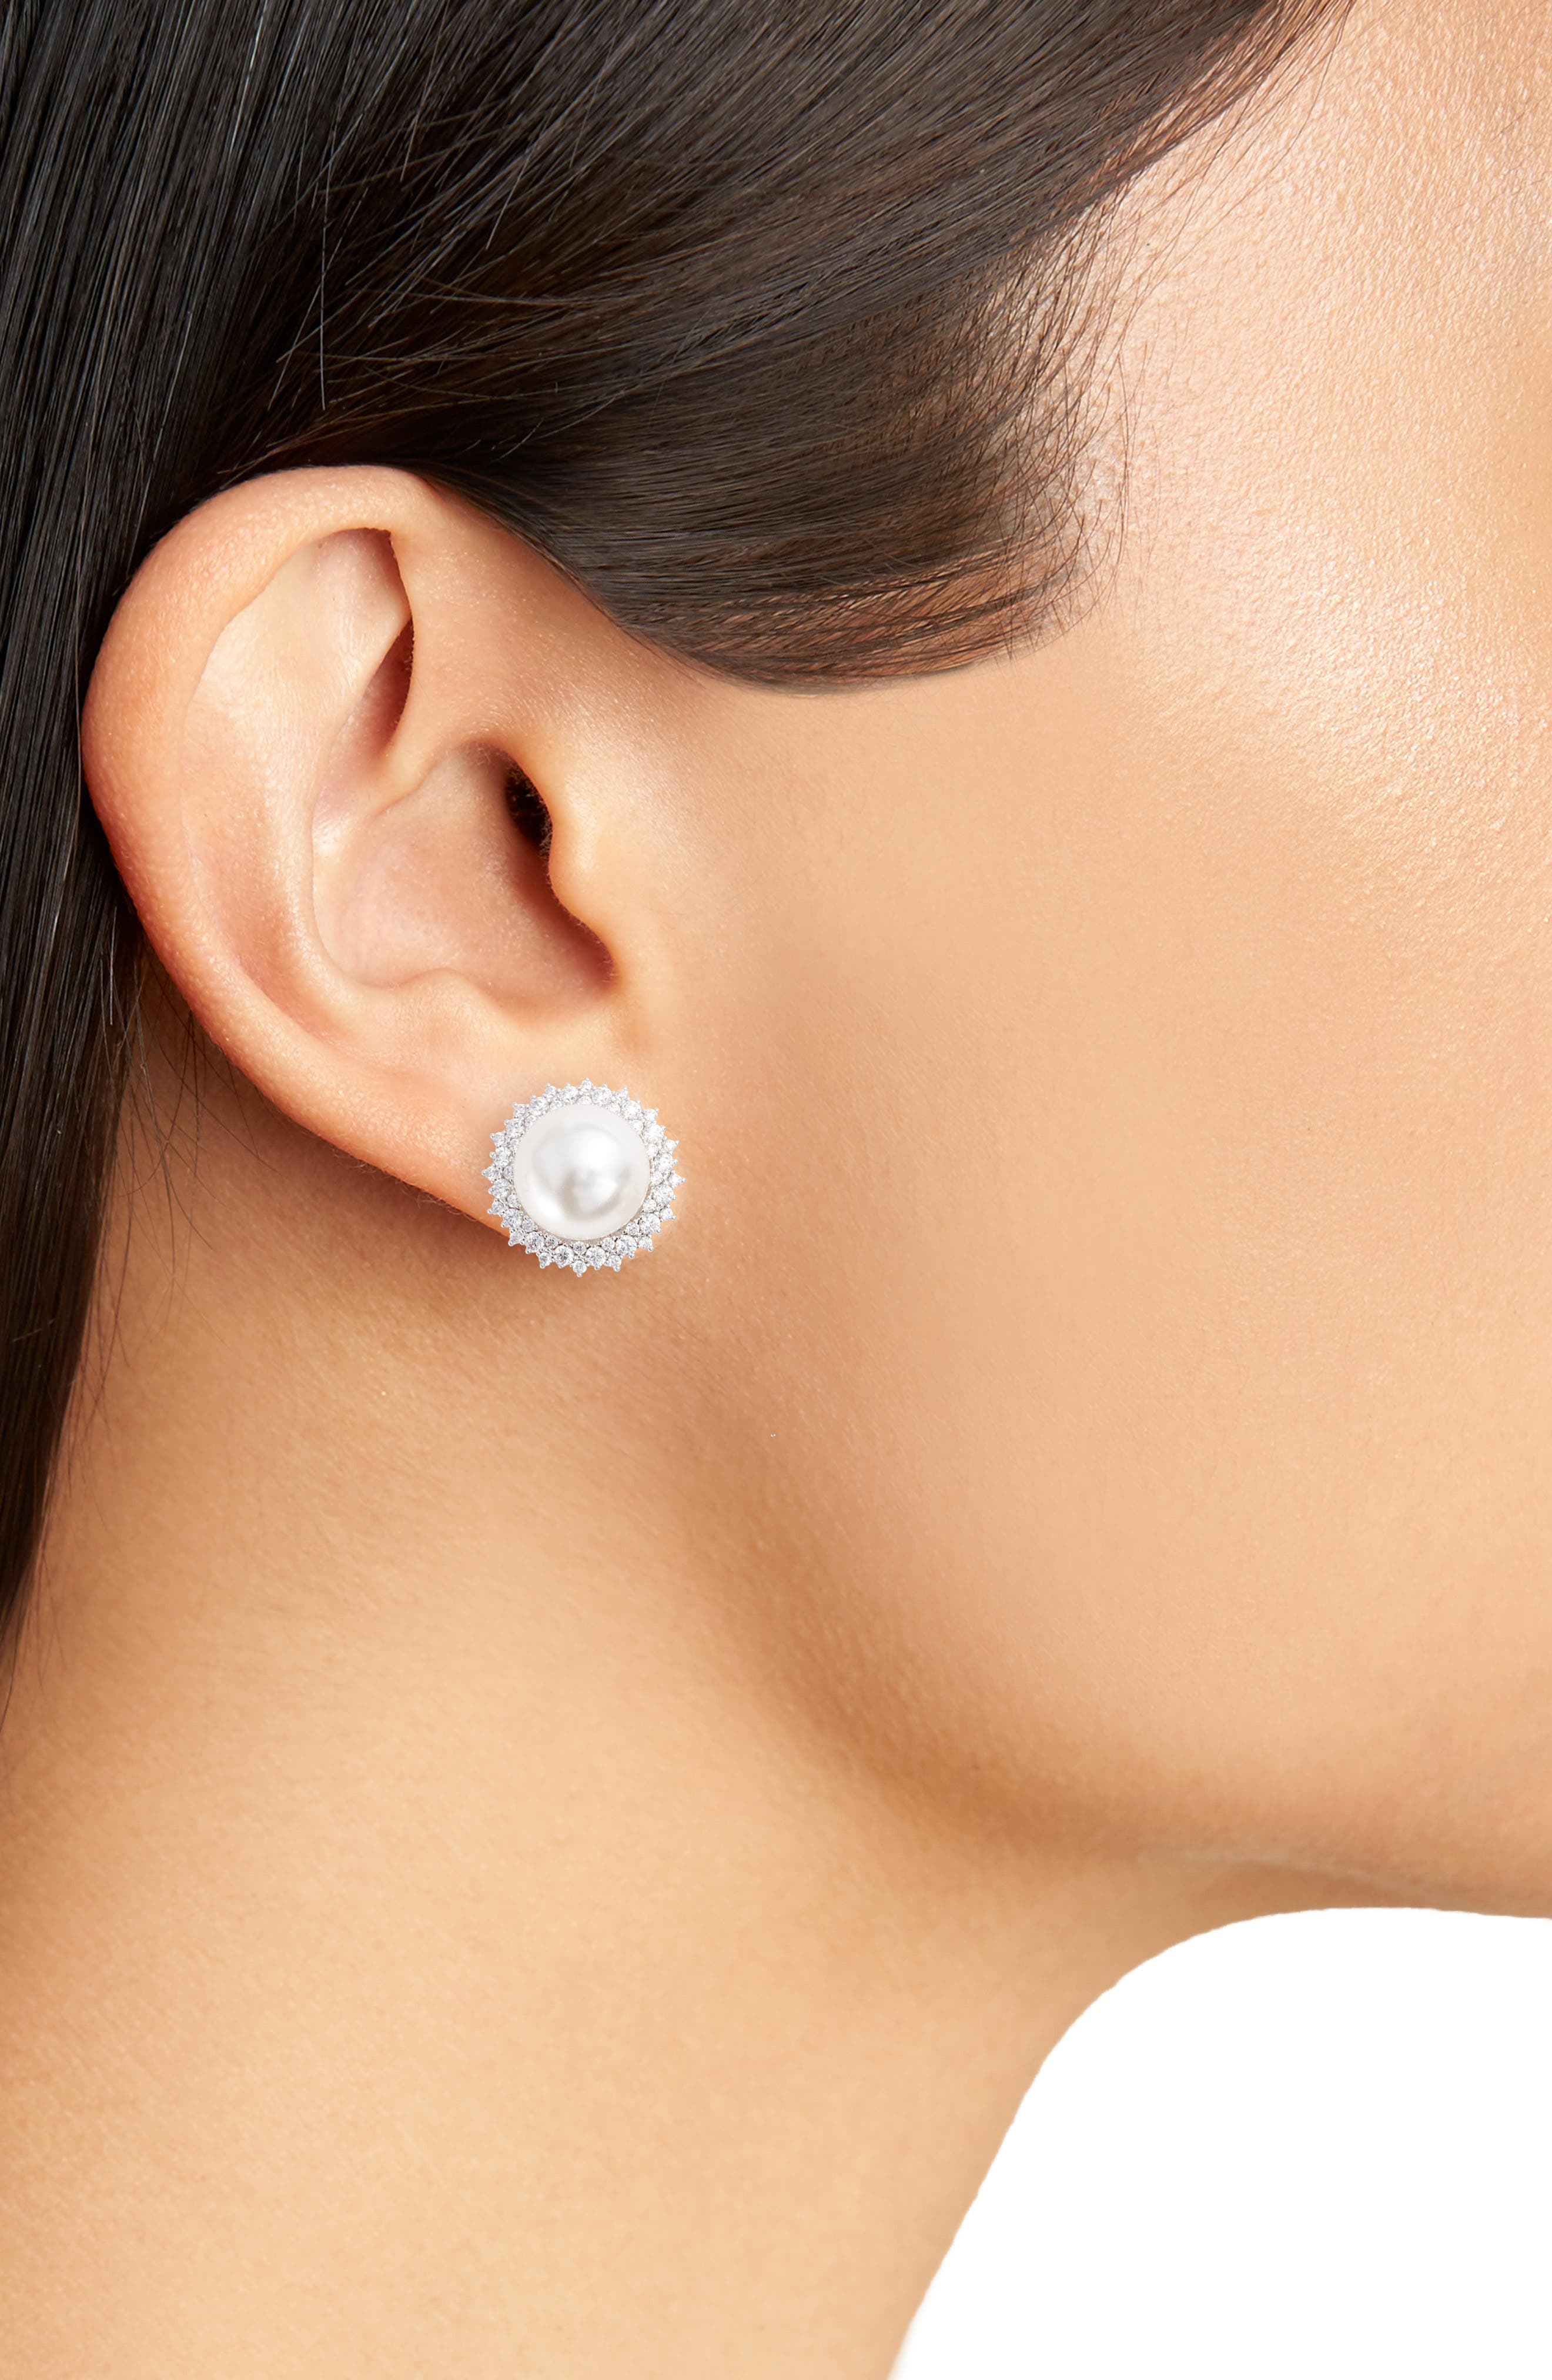 NADRI, Imitation Pearl Clip Stud Earrings, Alternate thumbnail 2, color, 040